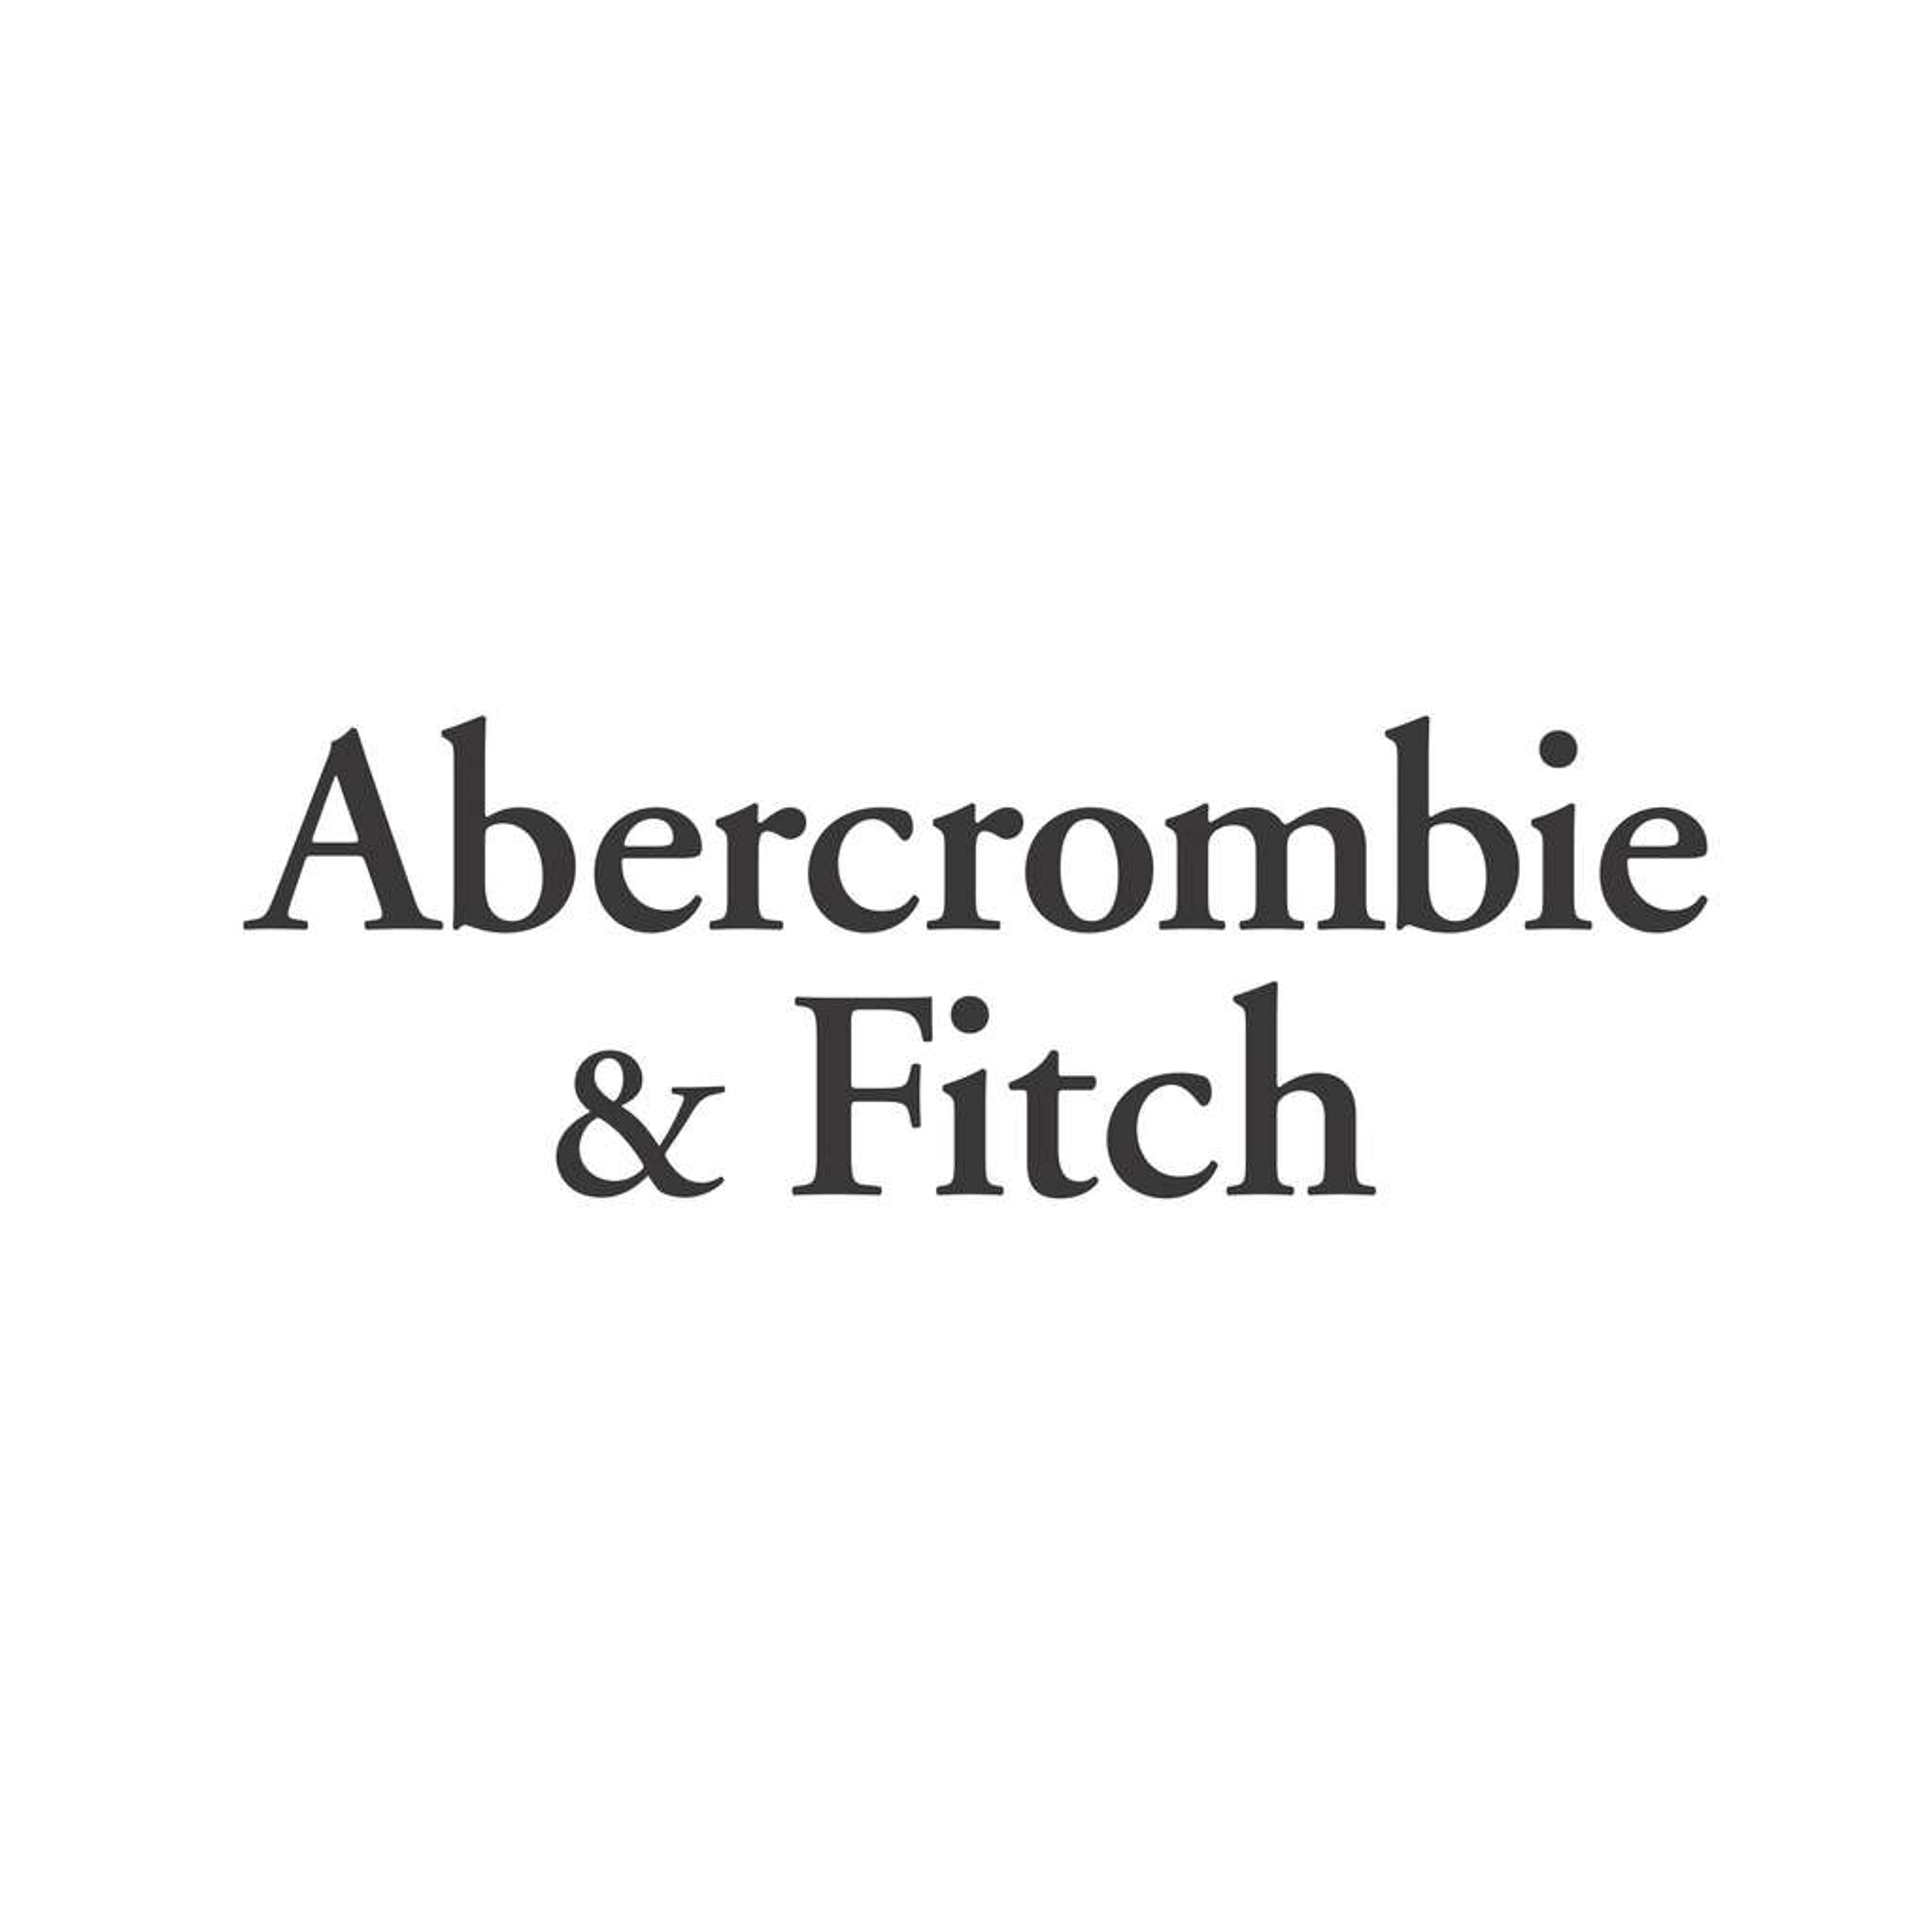 20 auf alles bei abercrombie fitch nur heute gratis versand ab 75 preisj ger. Black Bedroom Furniture Sets. Home Design Ideas